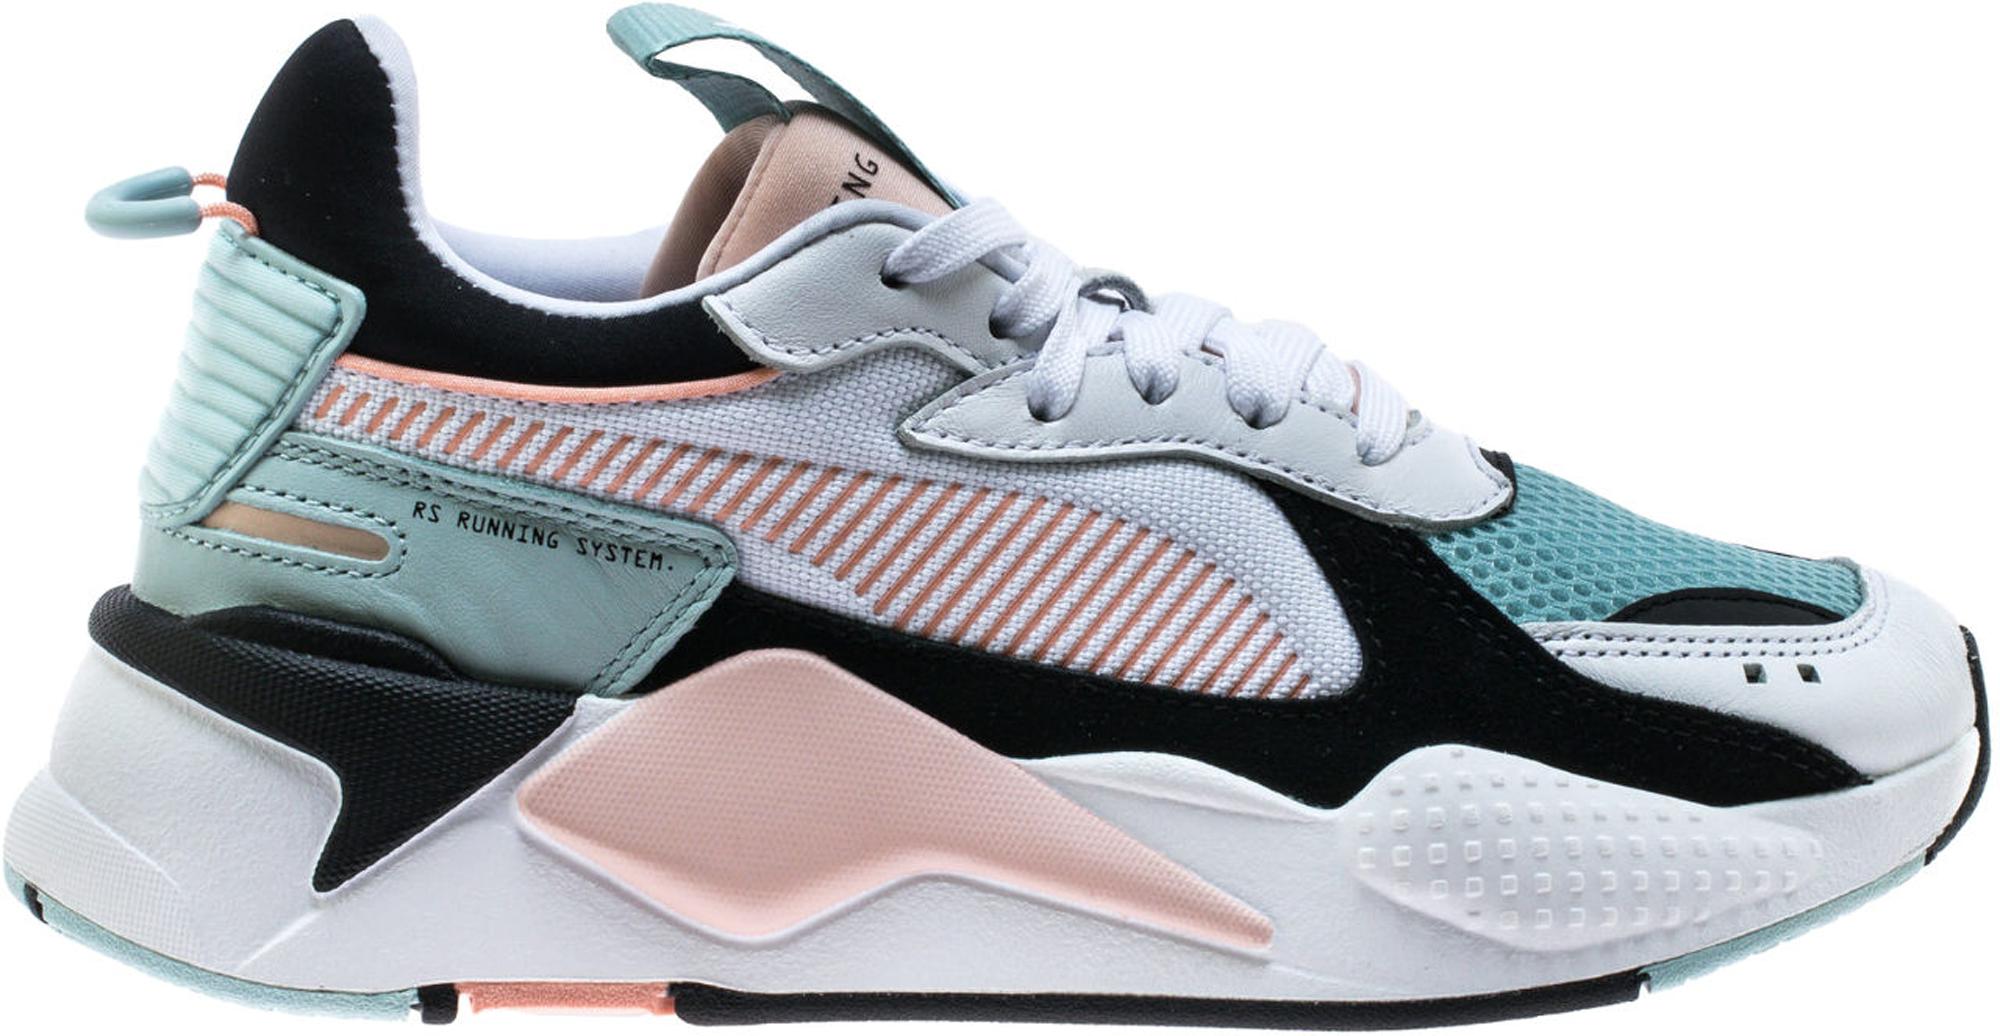 30+ Puma shoes rs x ideas ideas in 2021